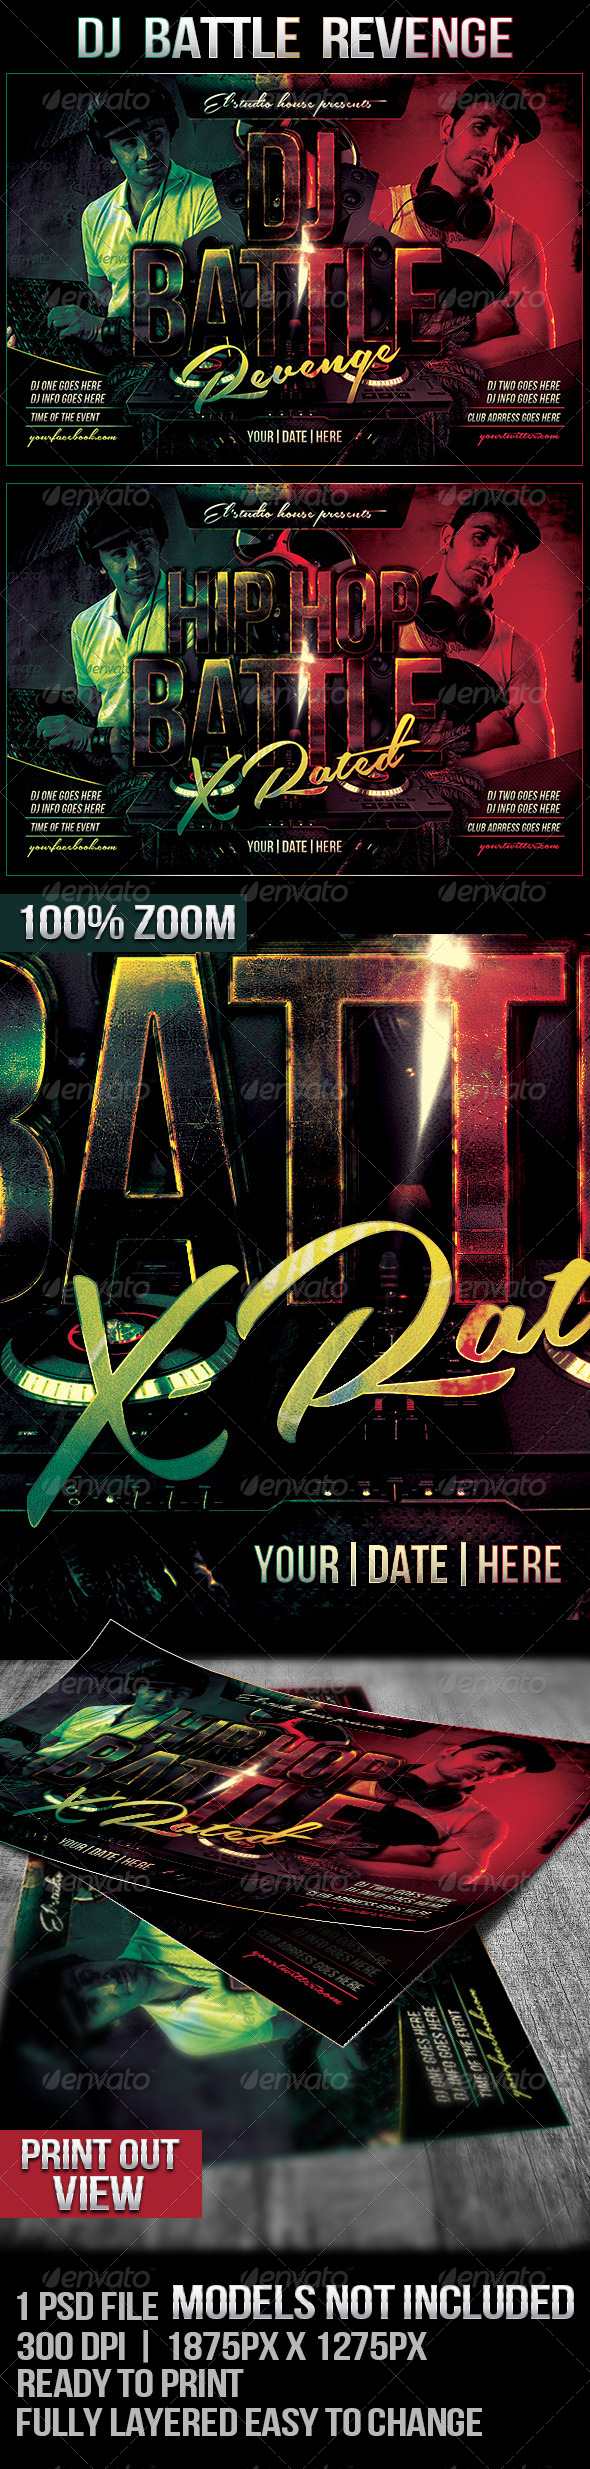 Dj Battle Revenge Rave Flyer - Flyers Print Templates